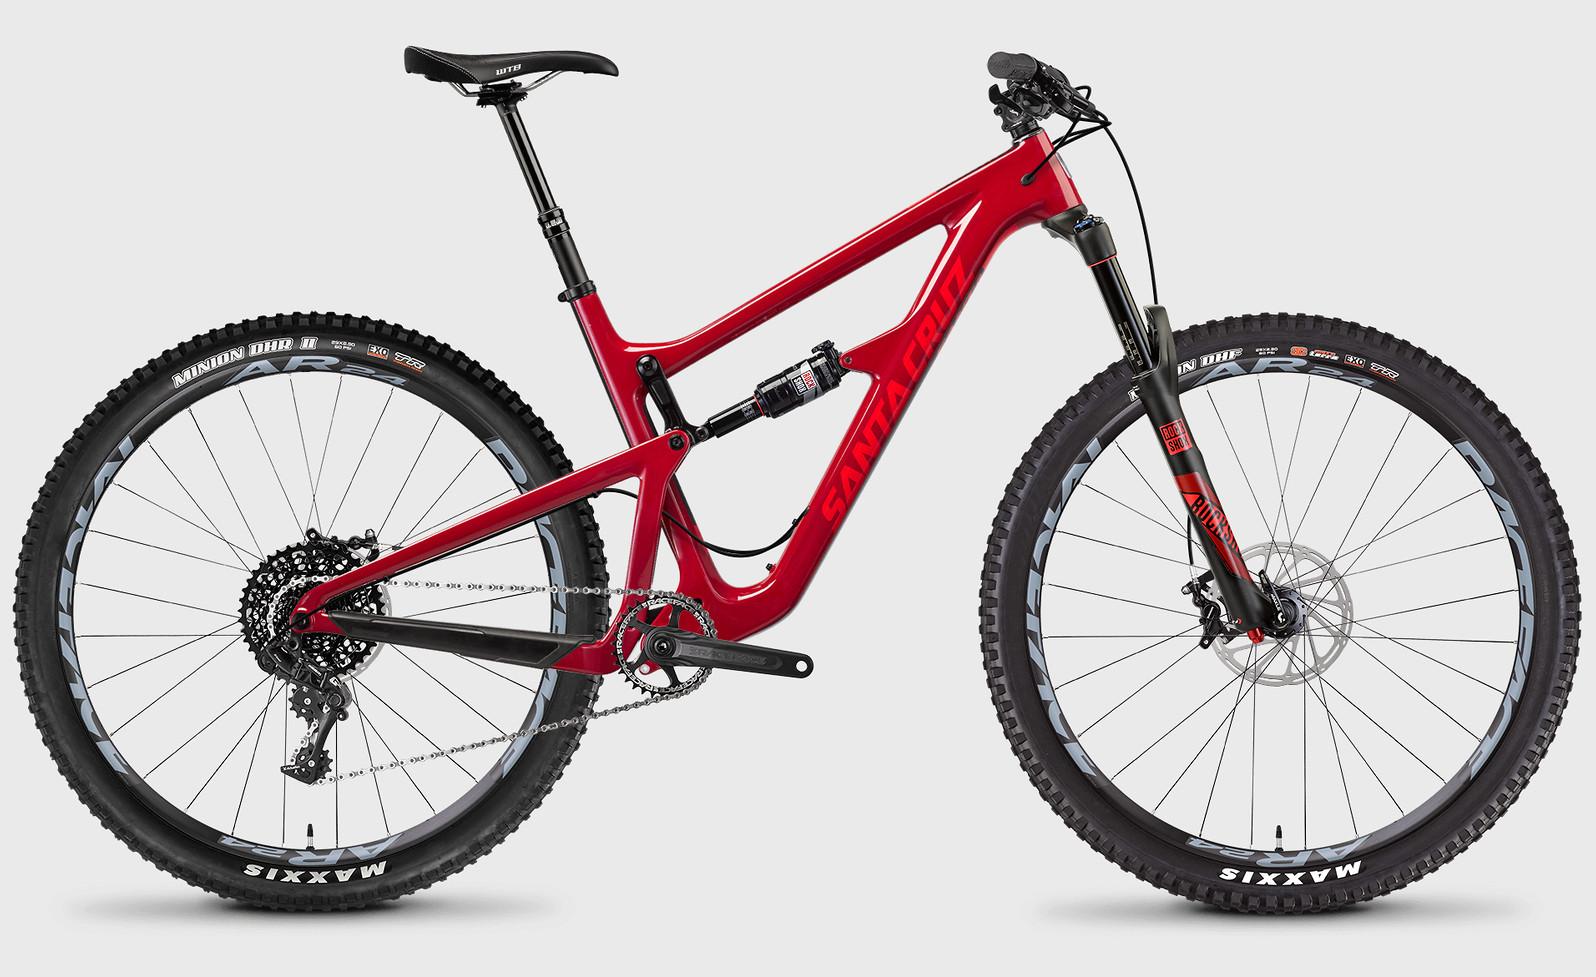 2017 santa cruz hightower c s bike sriracha red  [ 1596 x 977 Pixel ]